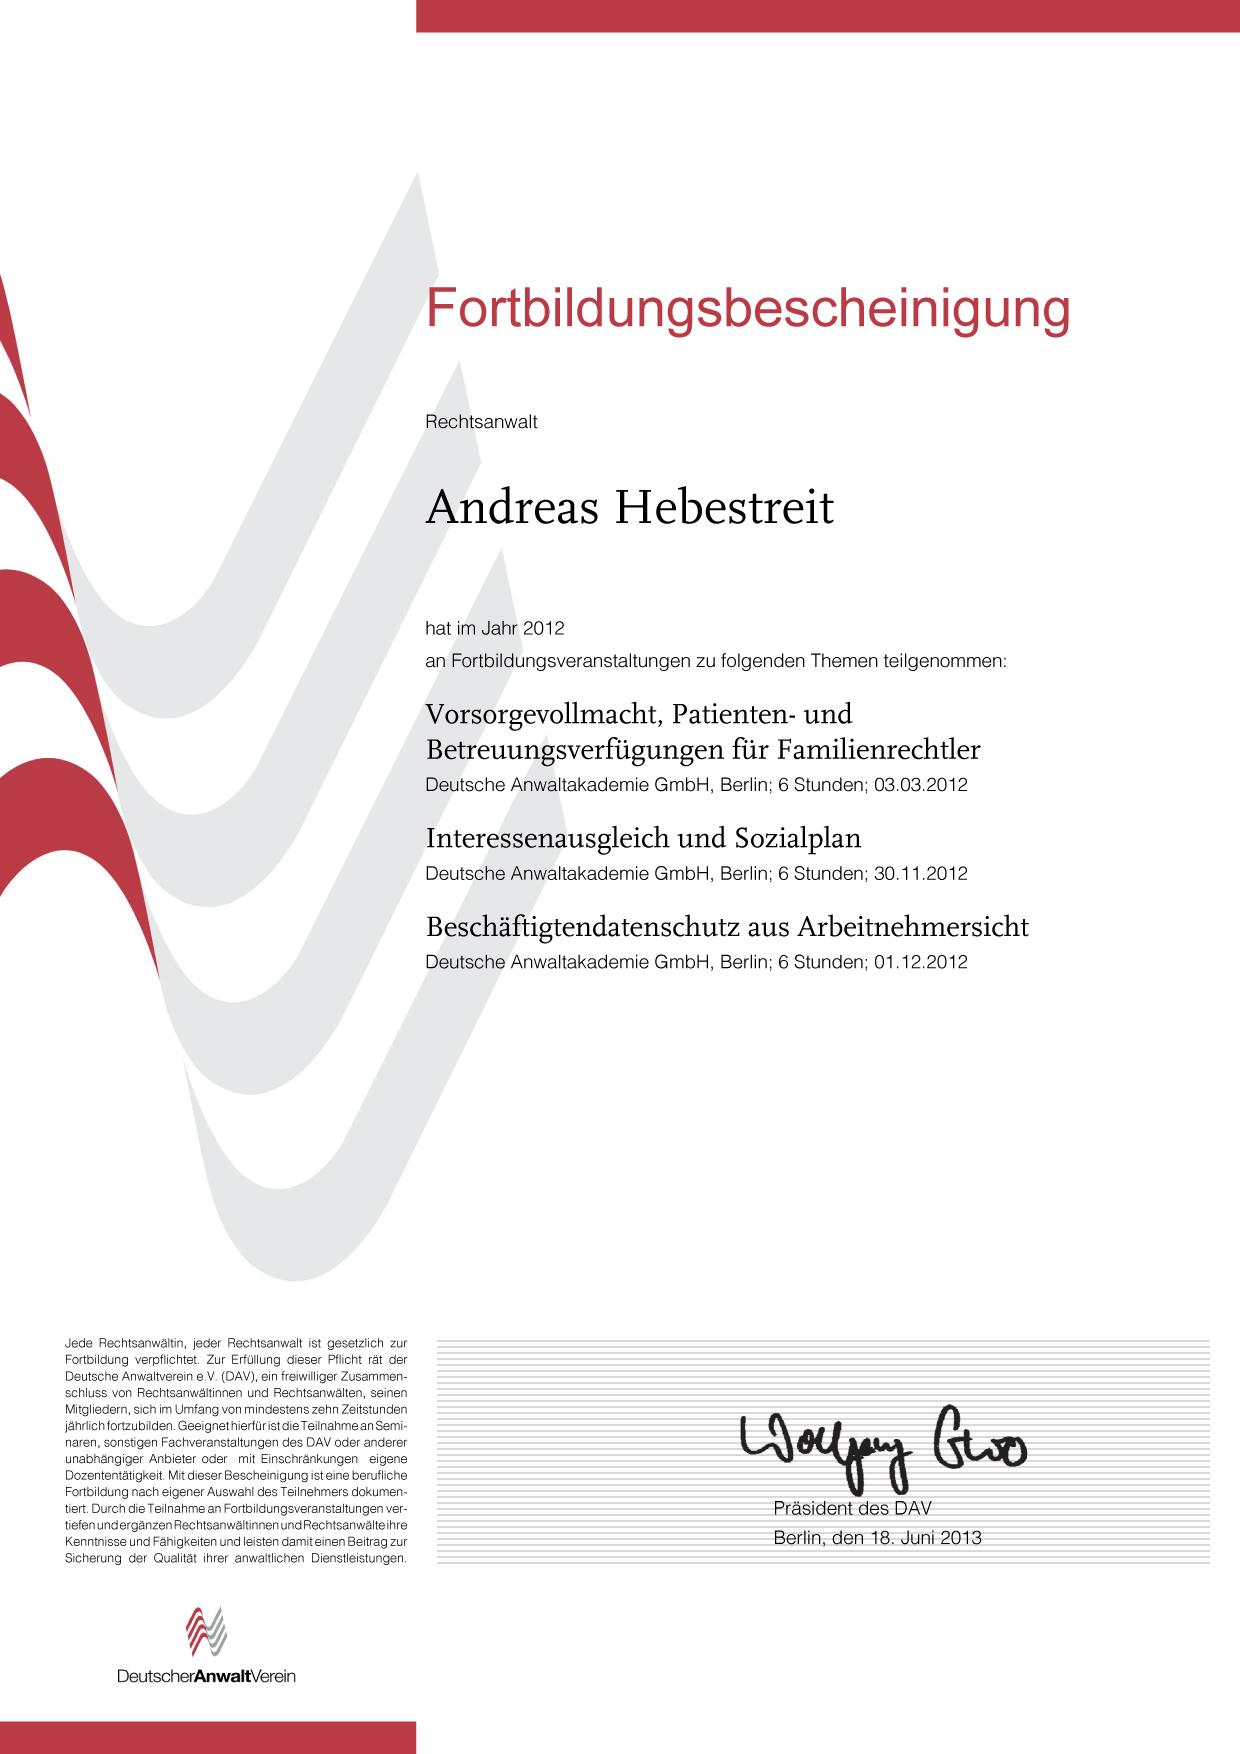 Fortbildungsbescheinigung Rechtsanwalt Kanzlei Andreas Hebestreit